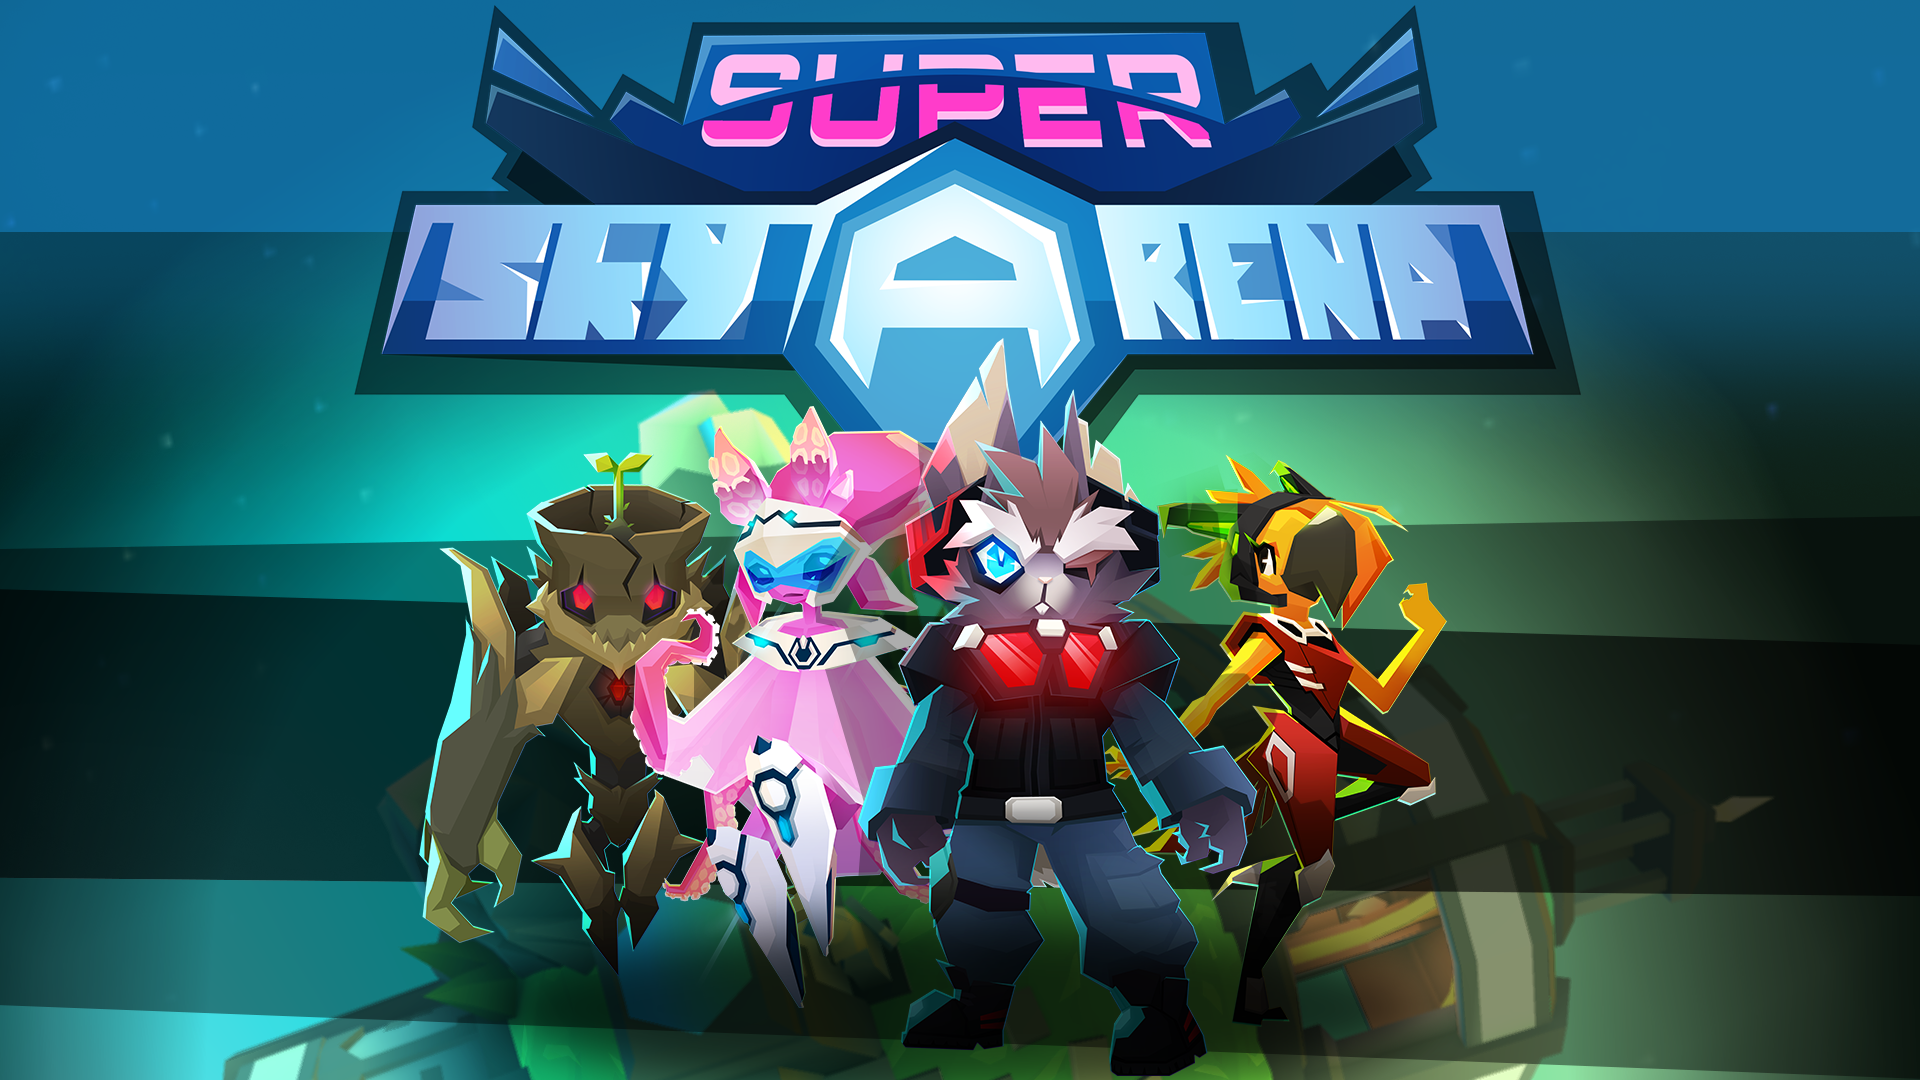 Super Sky Arena